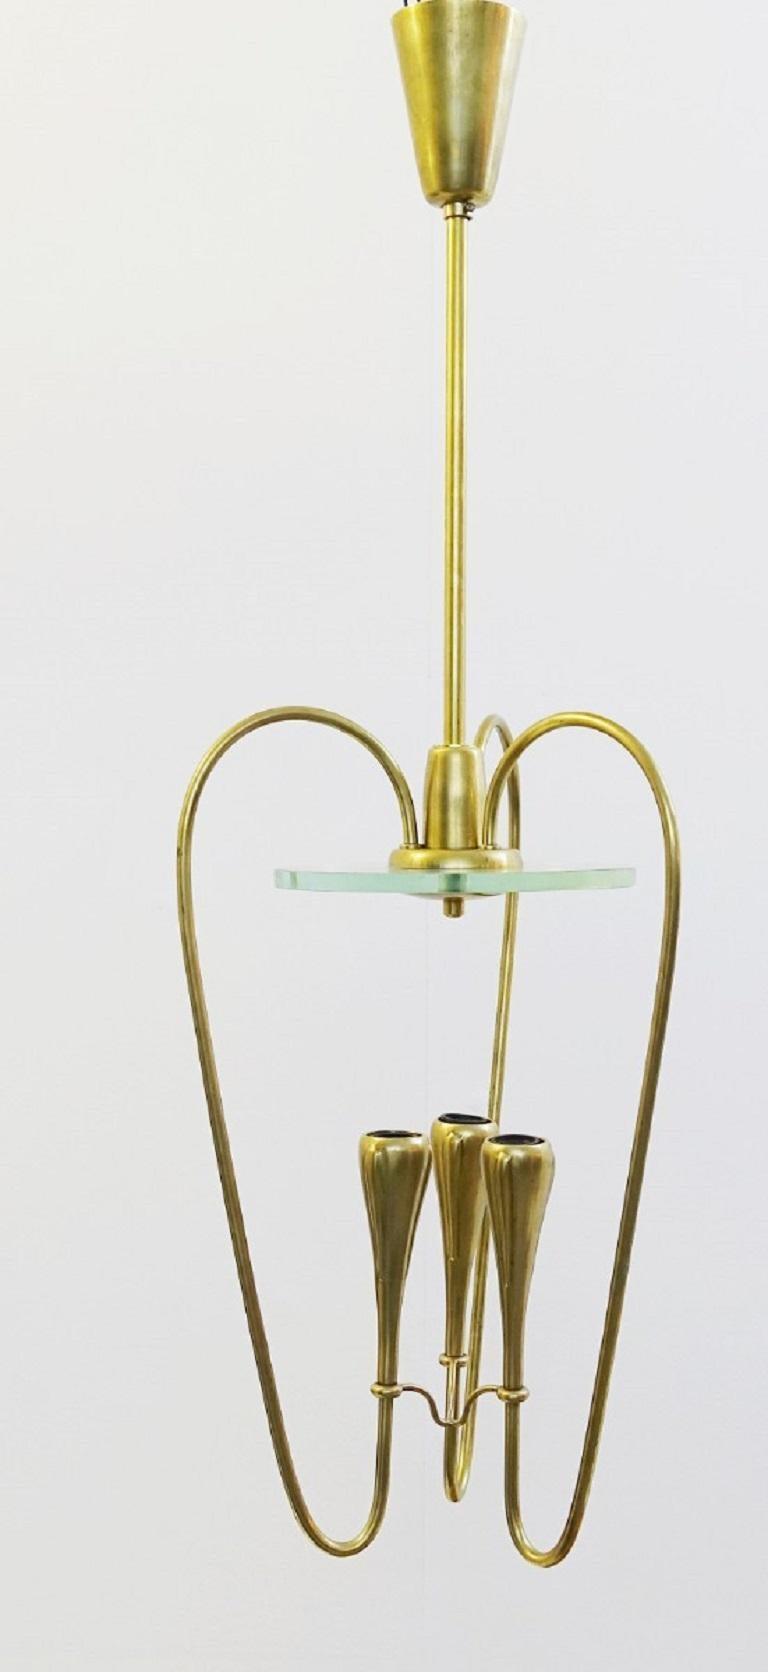 Mid-Century Modern Pair of Italian Fontana Arte Style Brass and Glass Pendants Light, Italy, 1970s For Sale